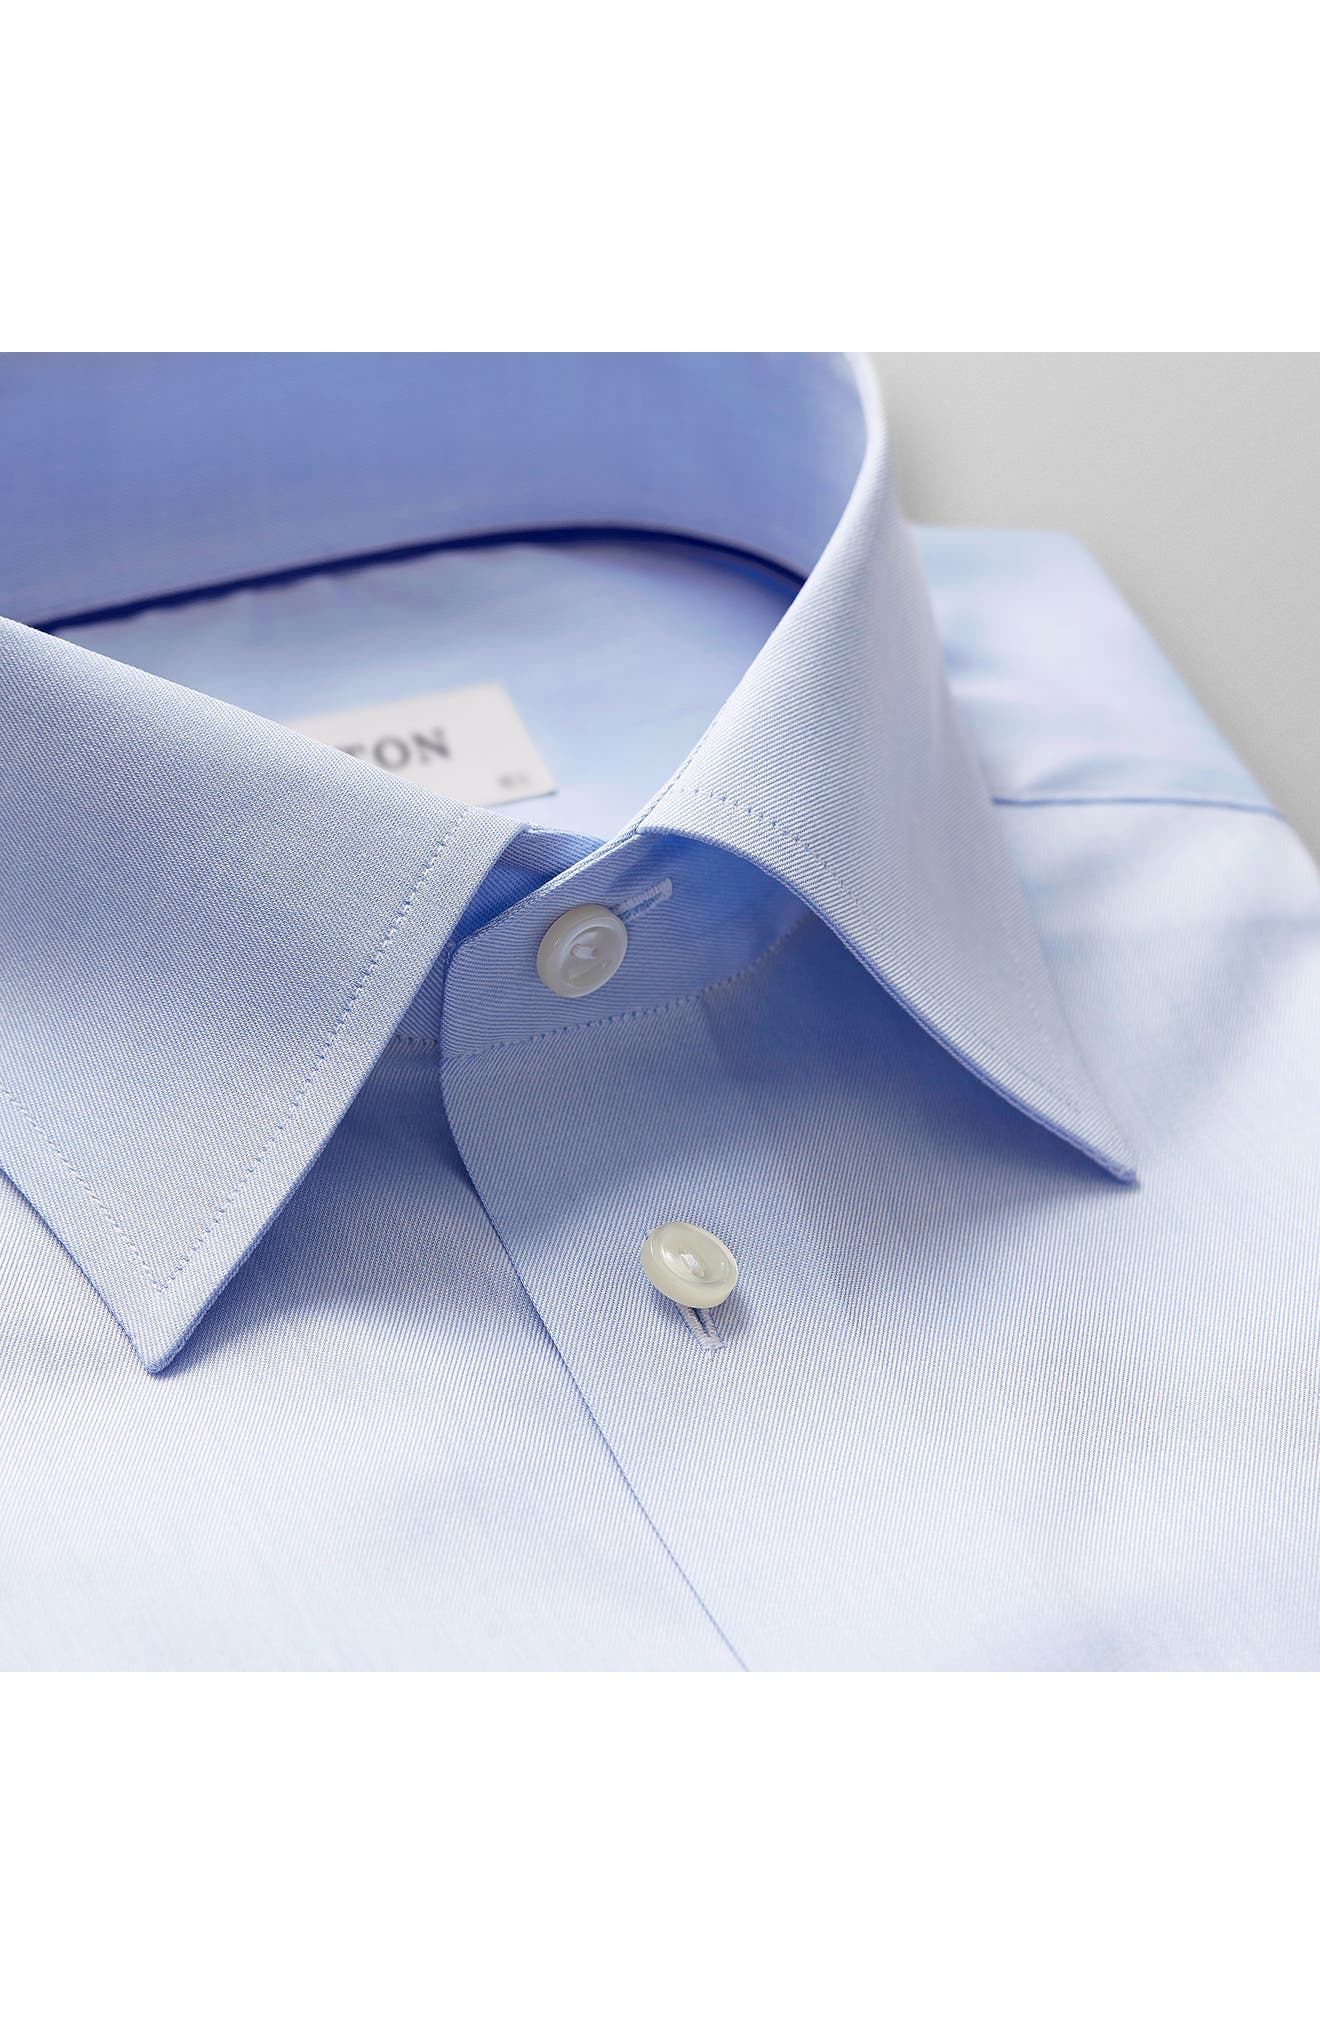 Classic Fit Twill Dress Shirt,                             Alternate thumbnail 2, color,                             Blue